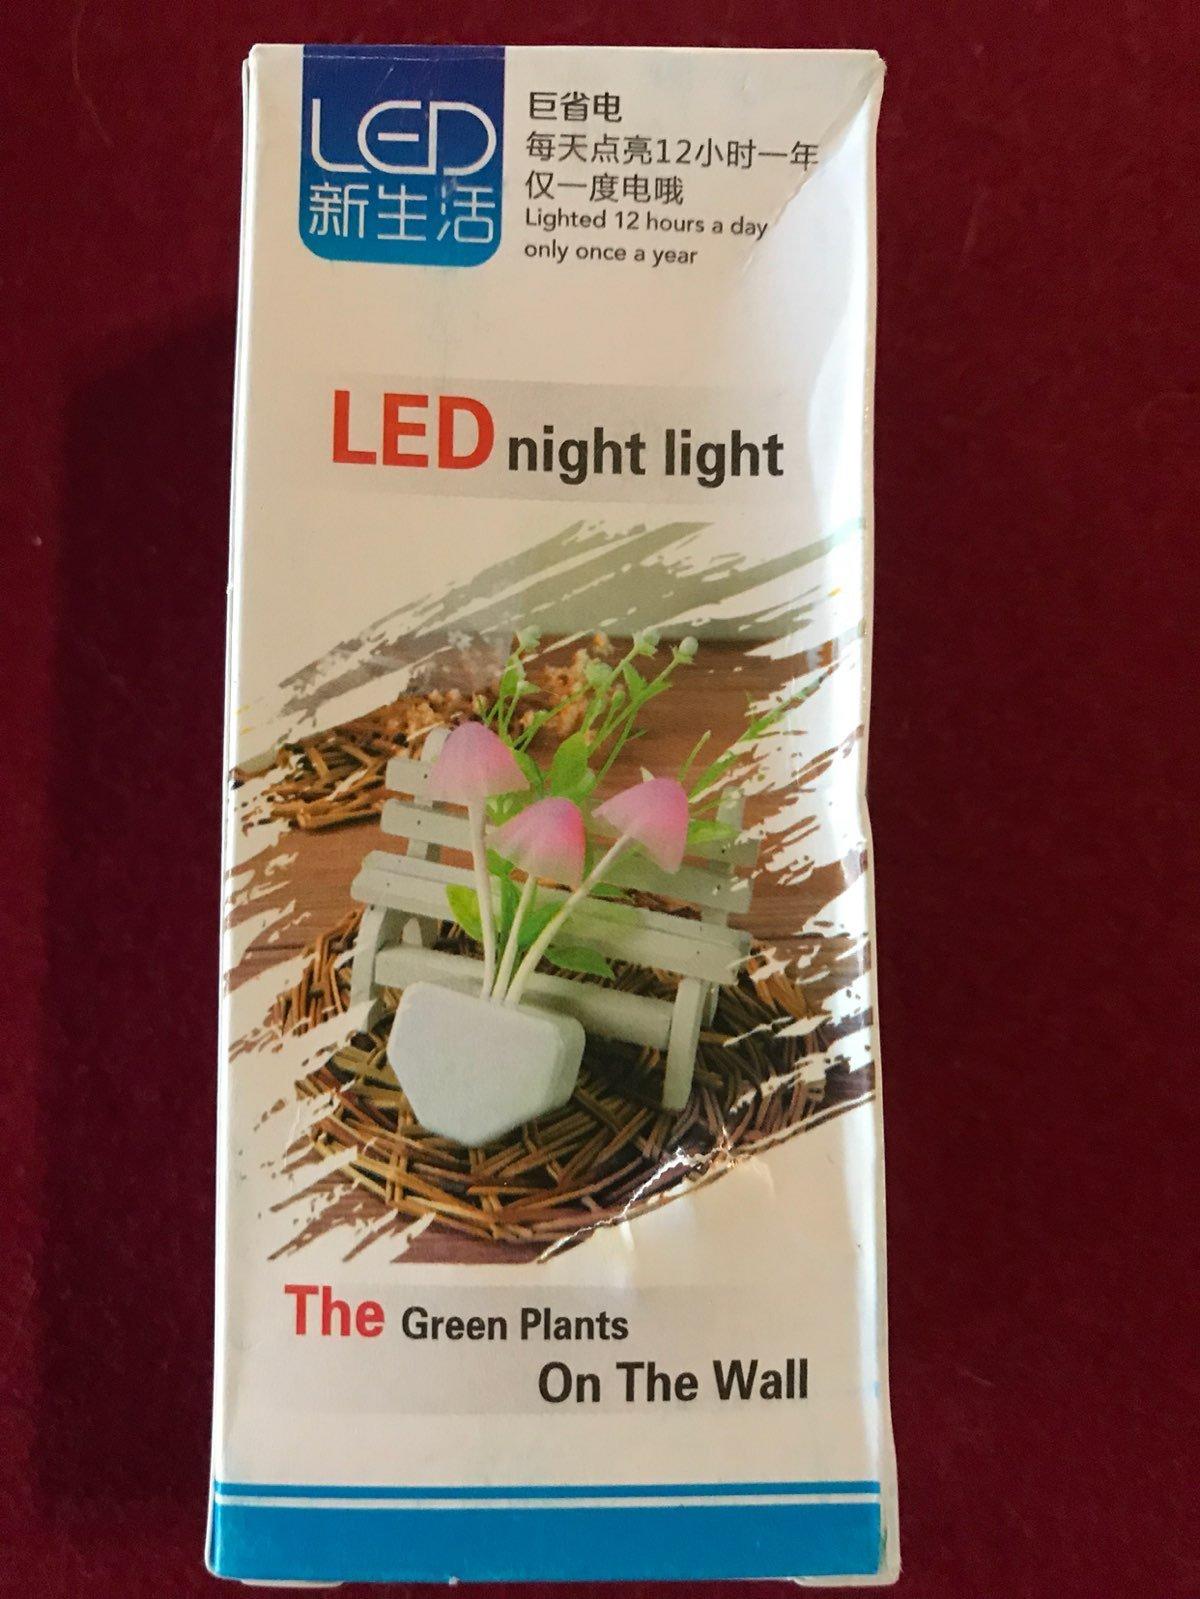 Sonic Toothbrush & LED Night Light